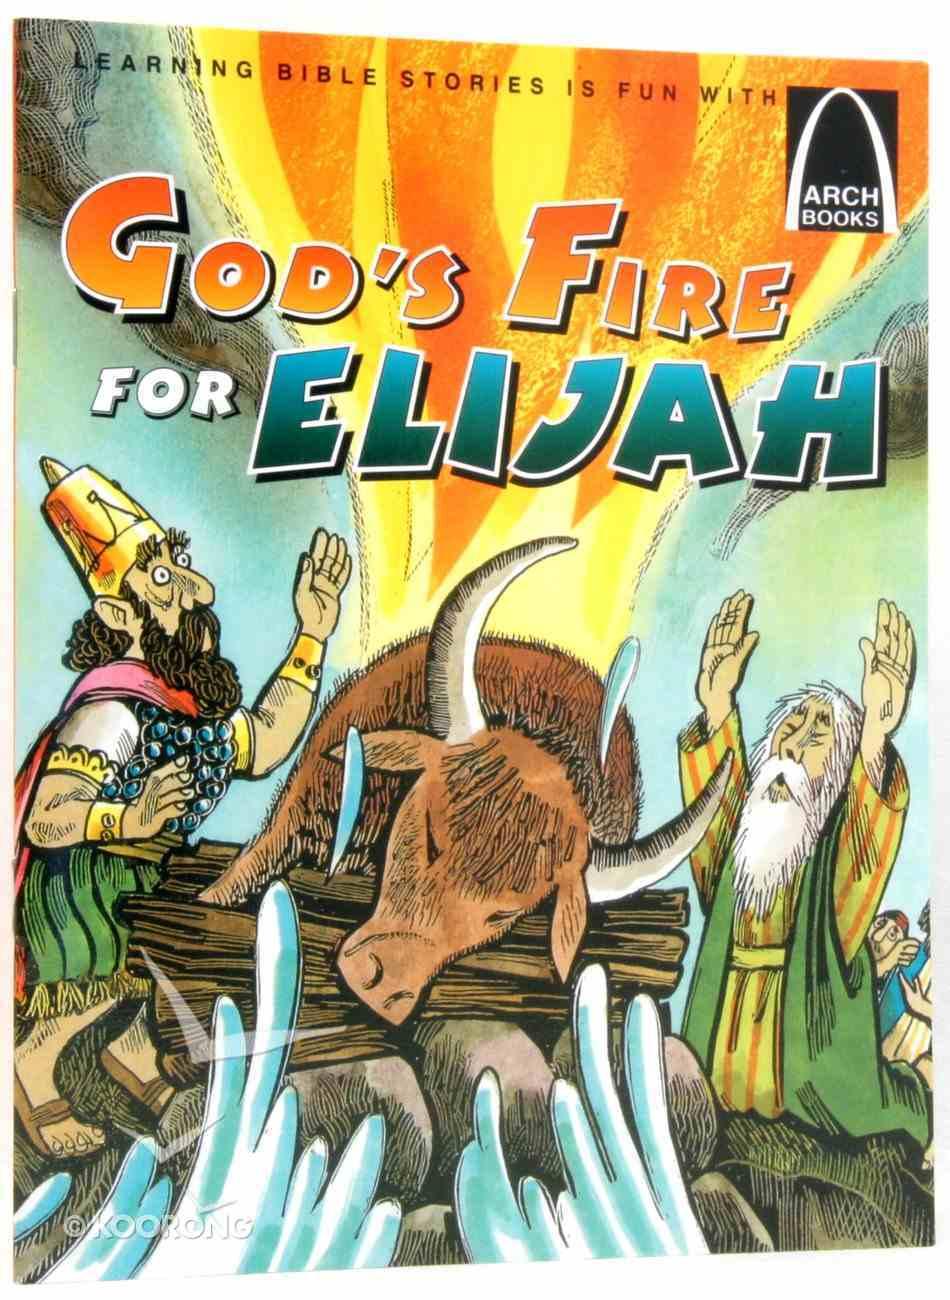 God's Fire For Elijah (Arch Books Series) Paperback